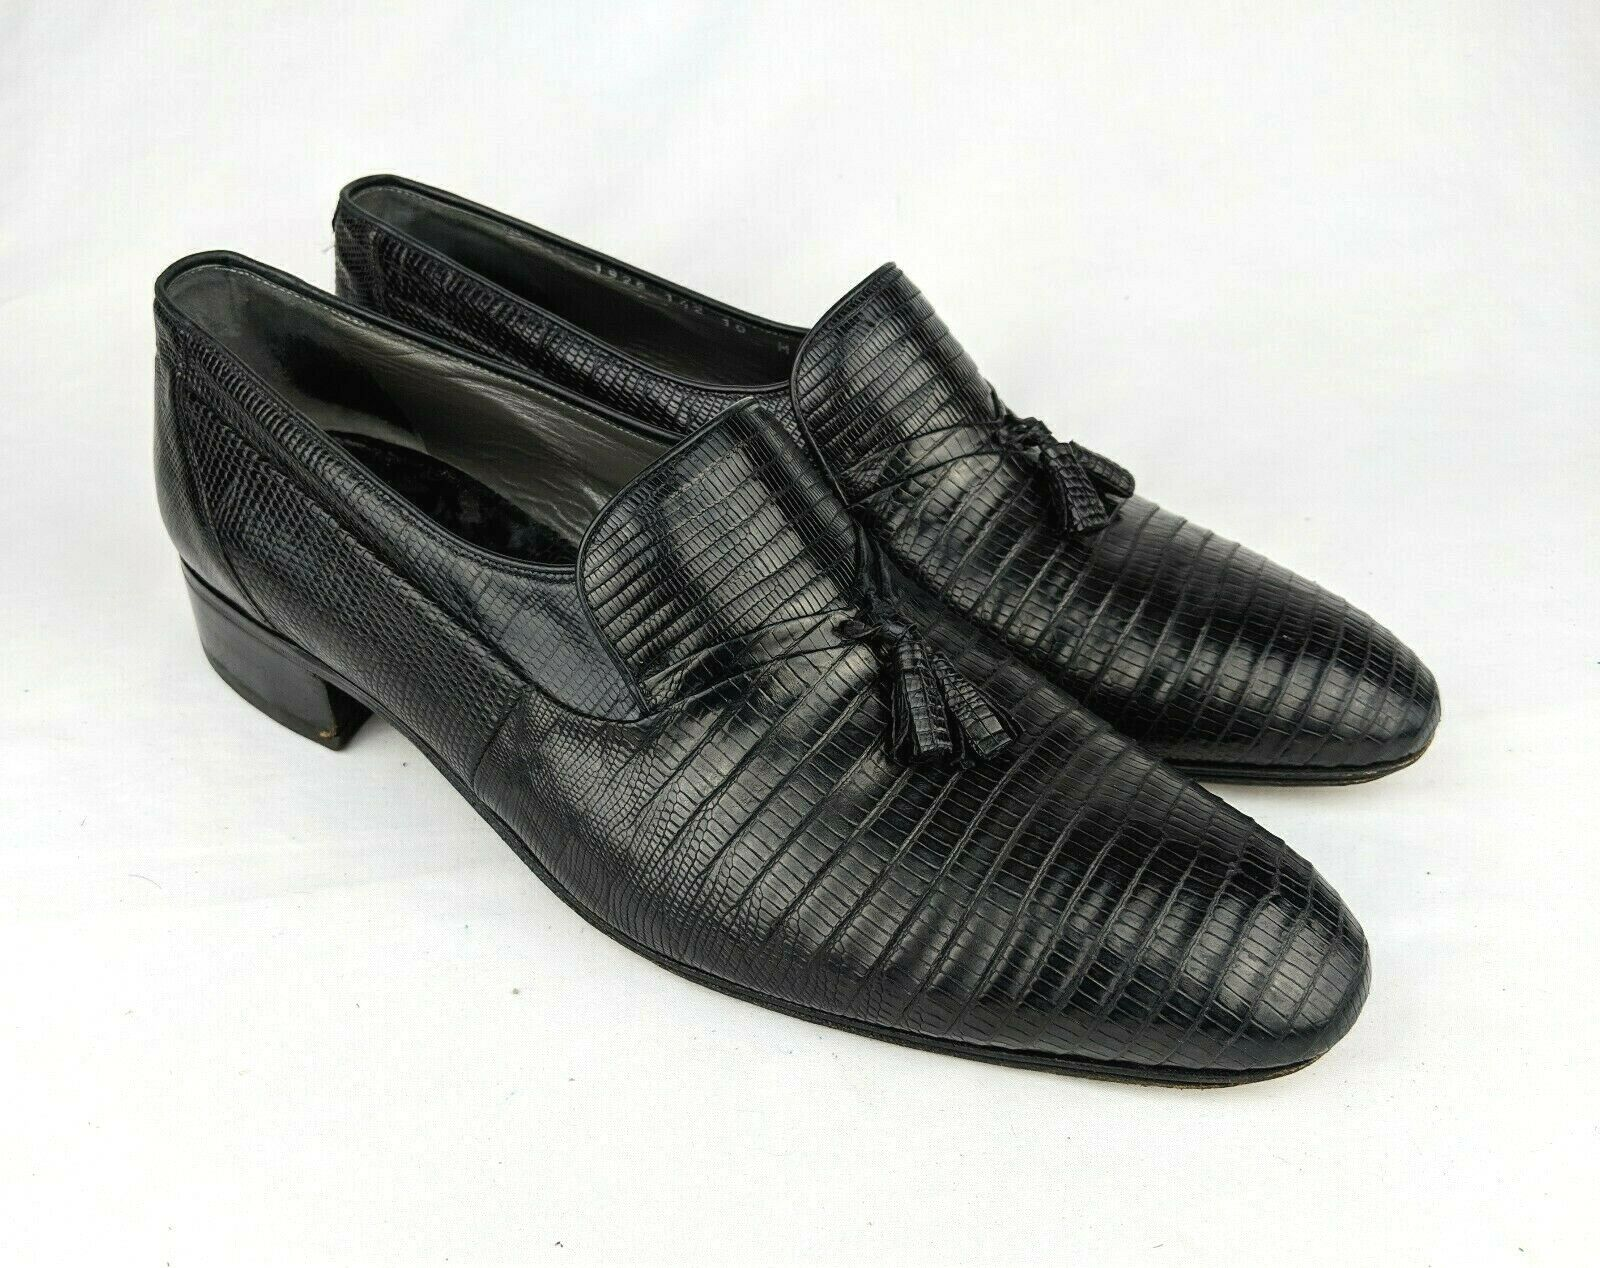 Mauri Made in  nero Lizard skin Tassel Loafers Men's 10M GUC Exquisite